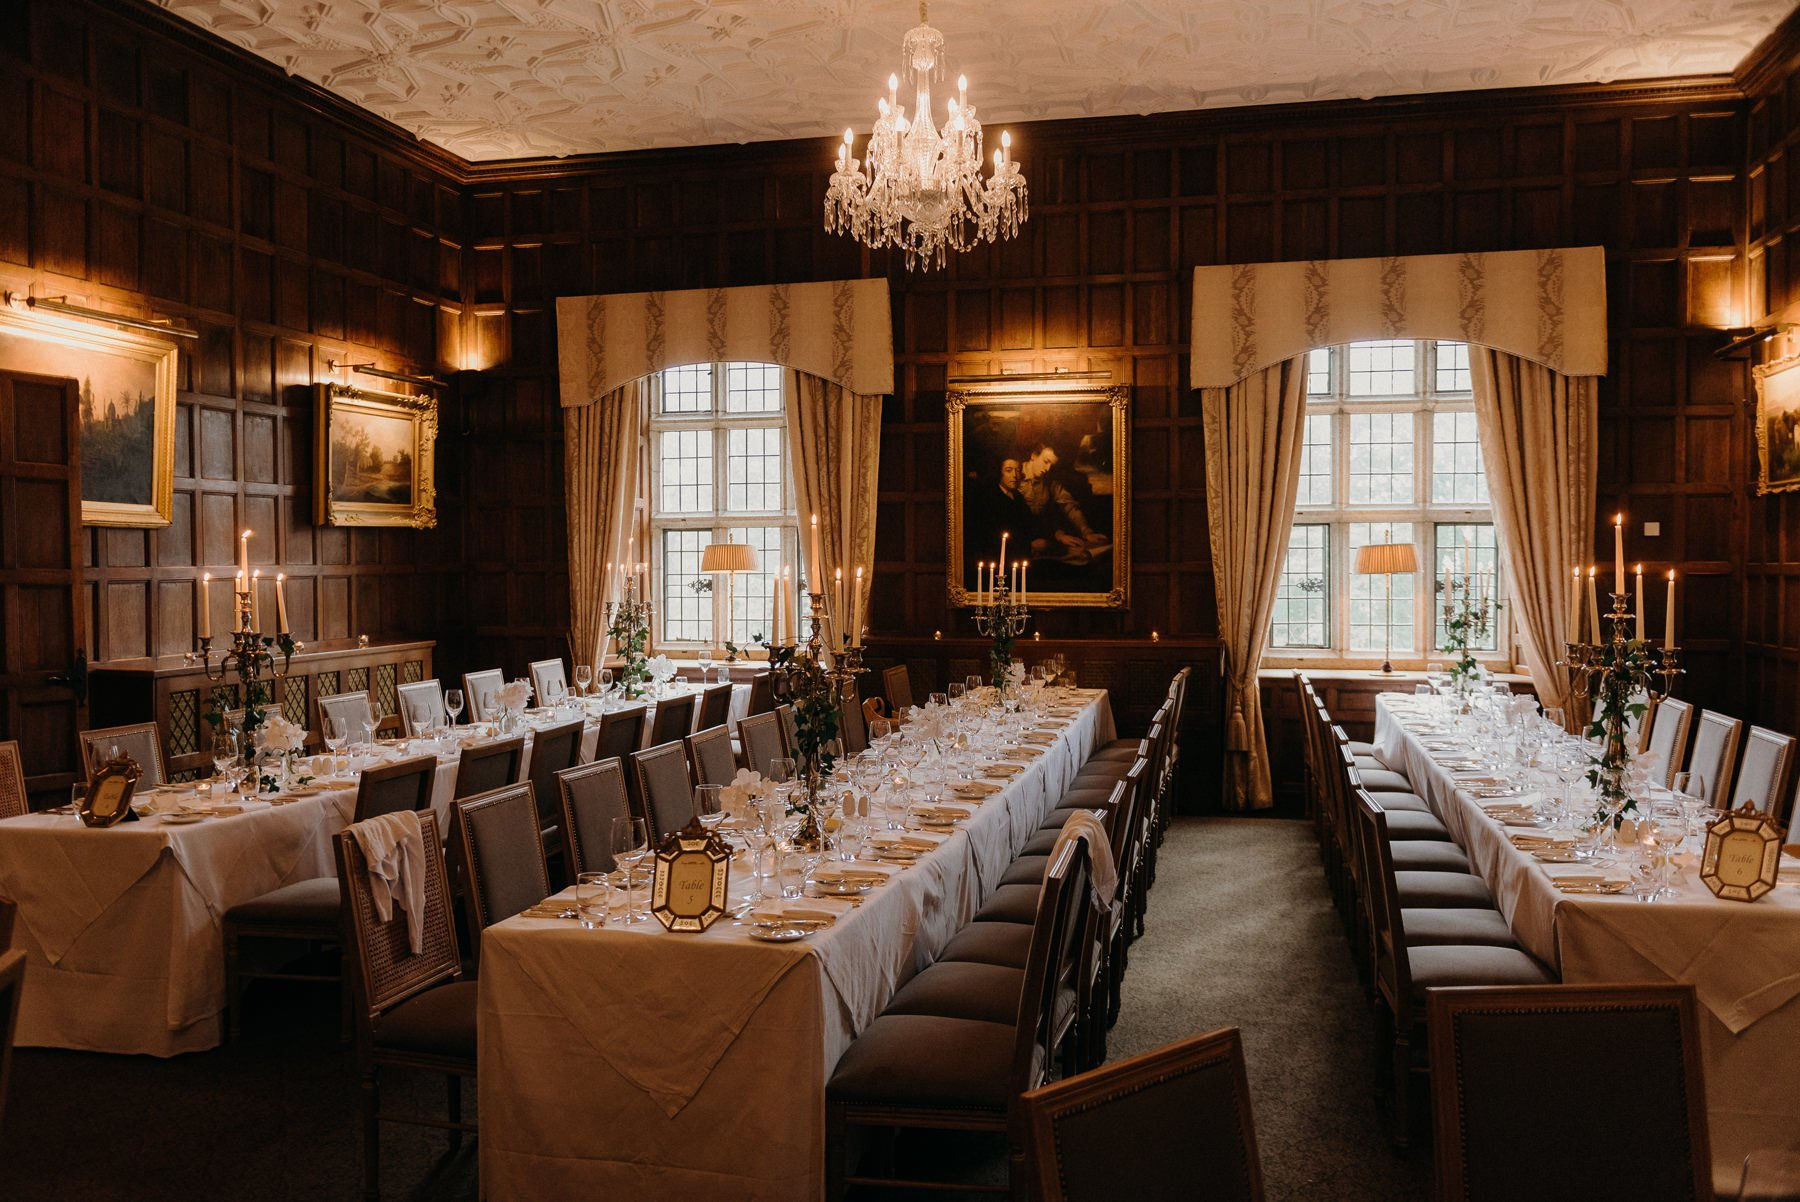 waterford-castle-wedding-venue